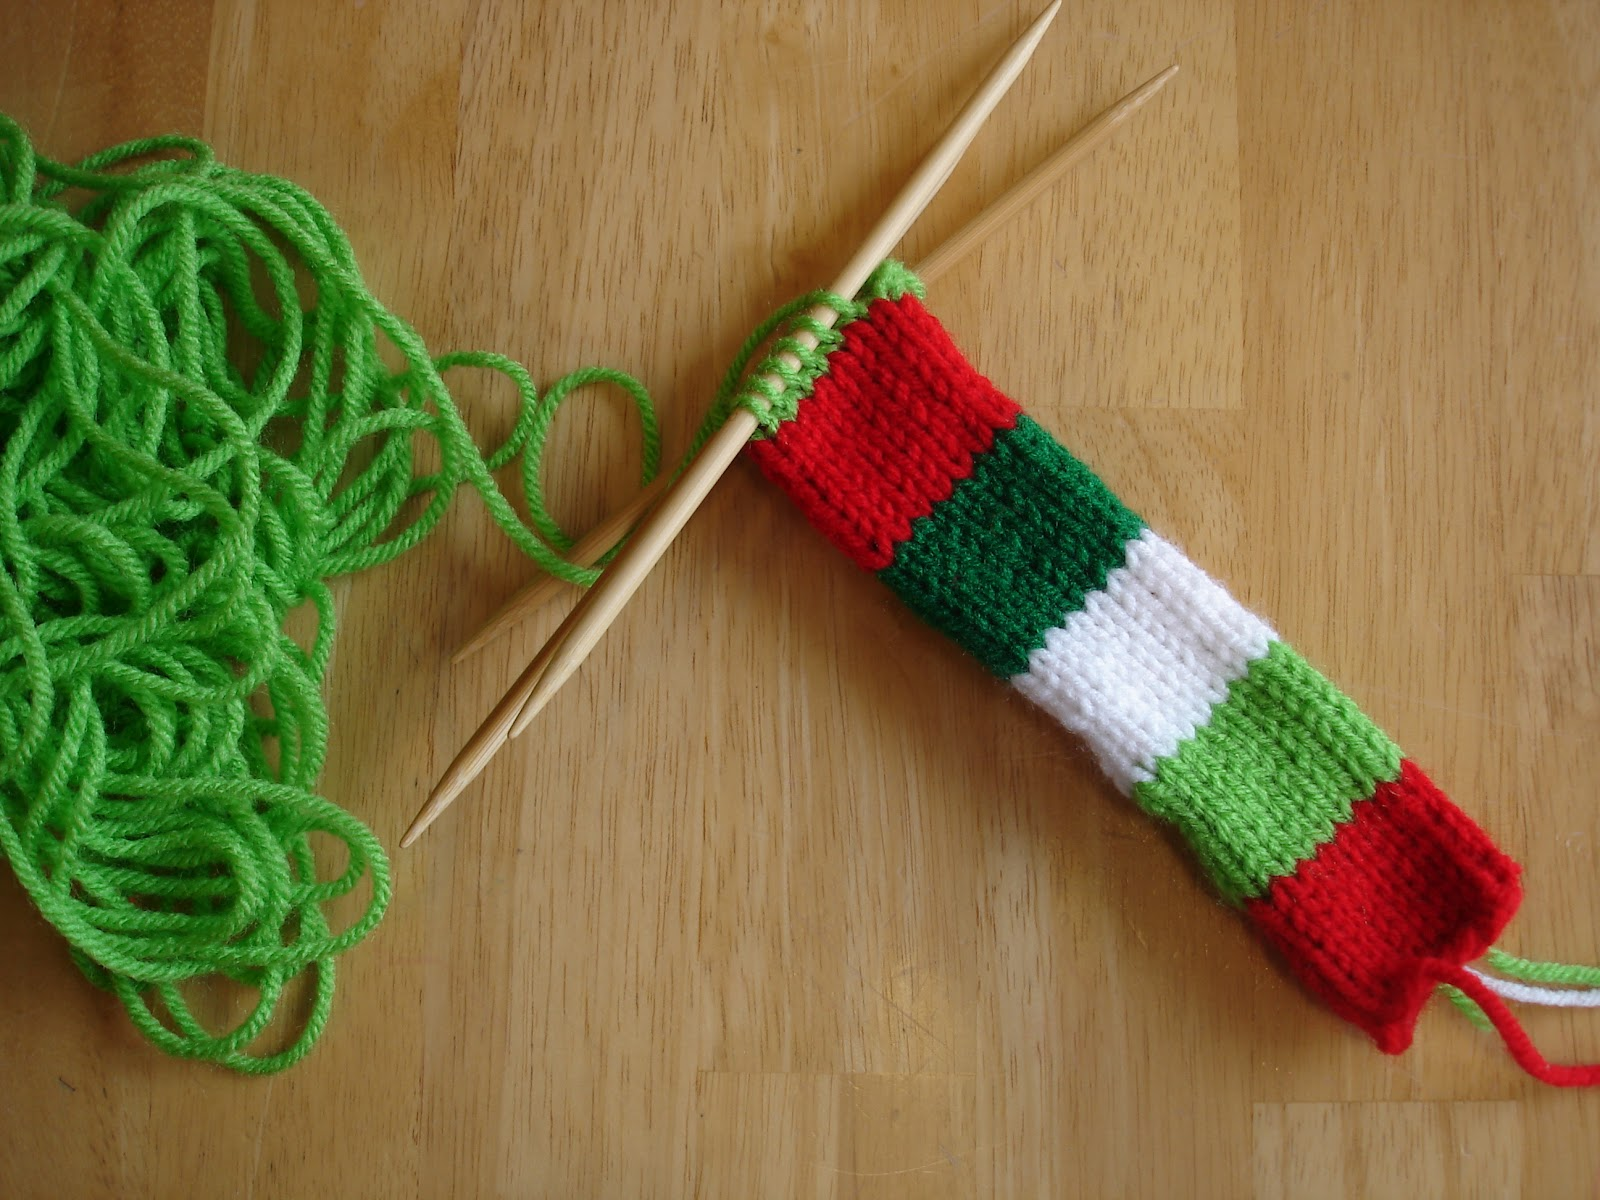 Knitted Collar Pattern : Fiber Flux: Free Knitting Pattern...Festive Dog Collar Sleeve!